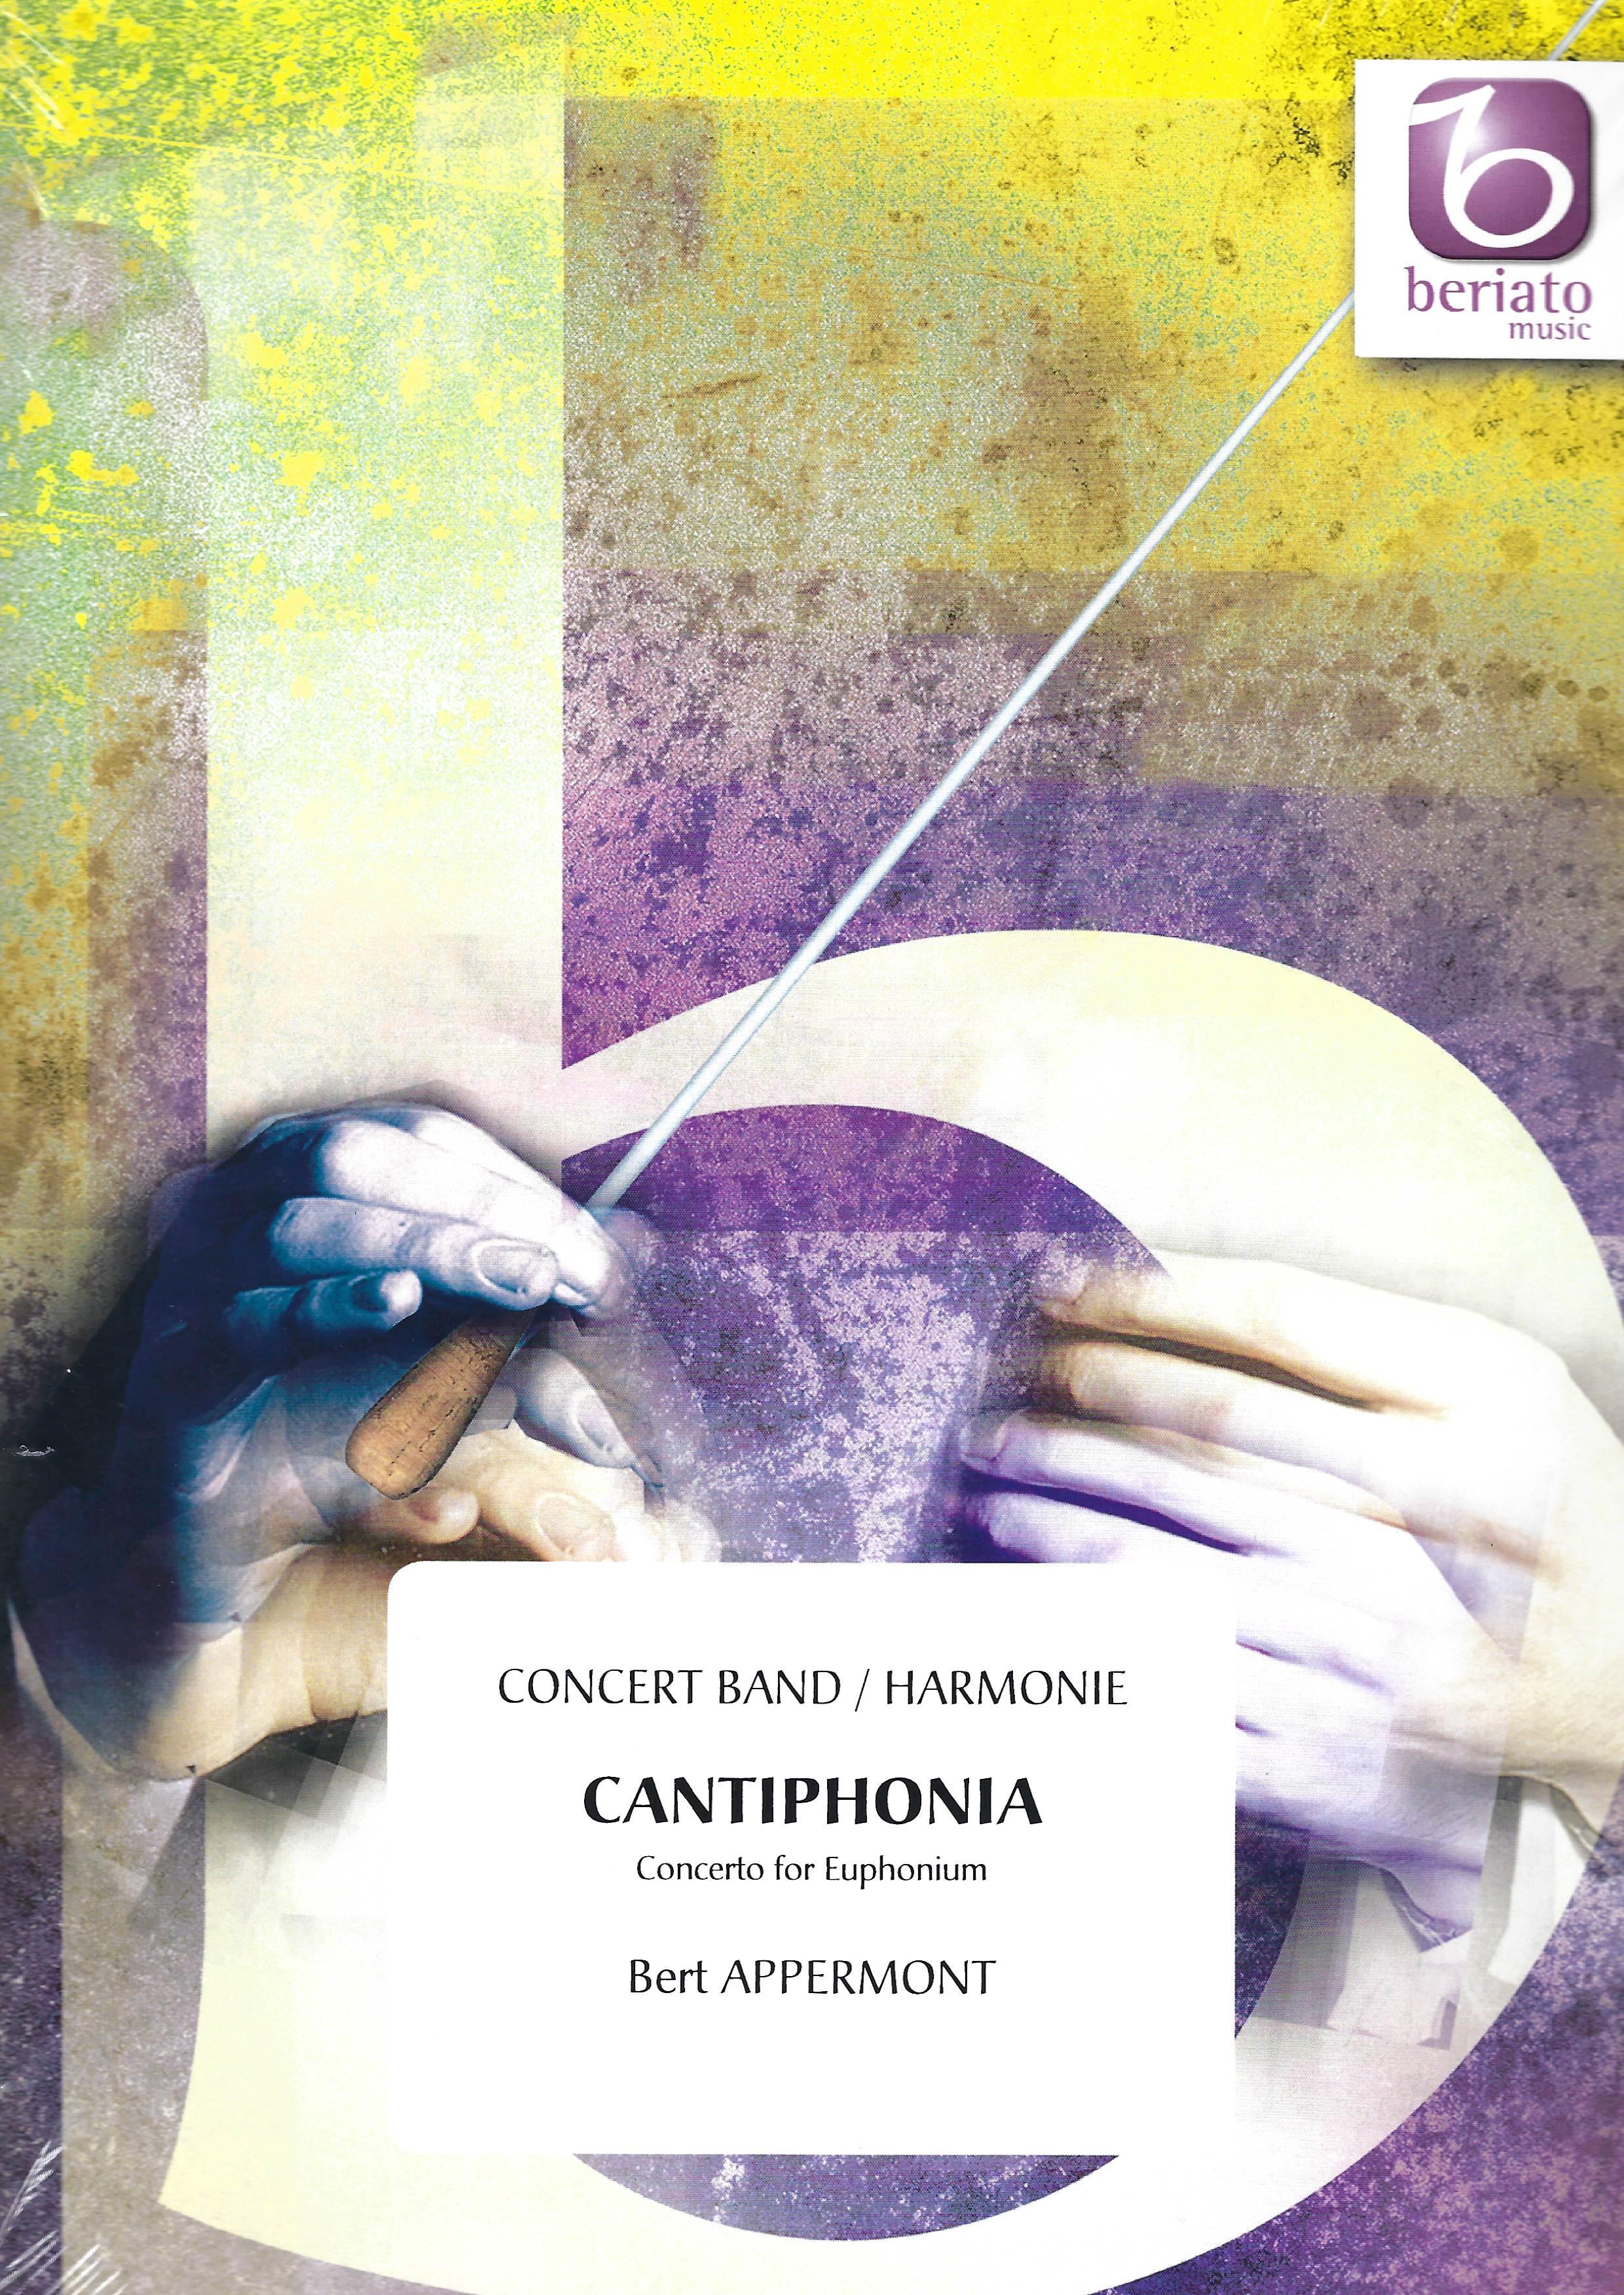 Cantiphonia (Concerto for Euphonium) - Bert Appermont - Euphonium and Wind Band/Concert Band/Harmonie